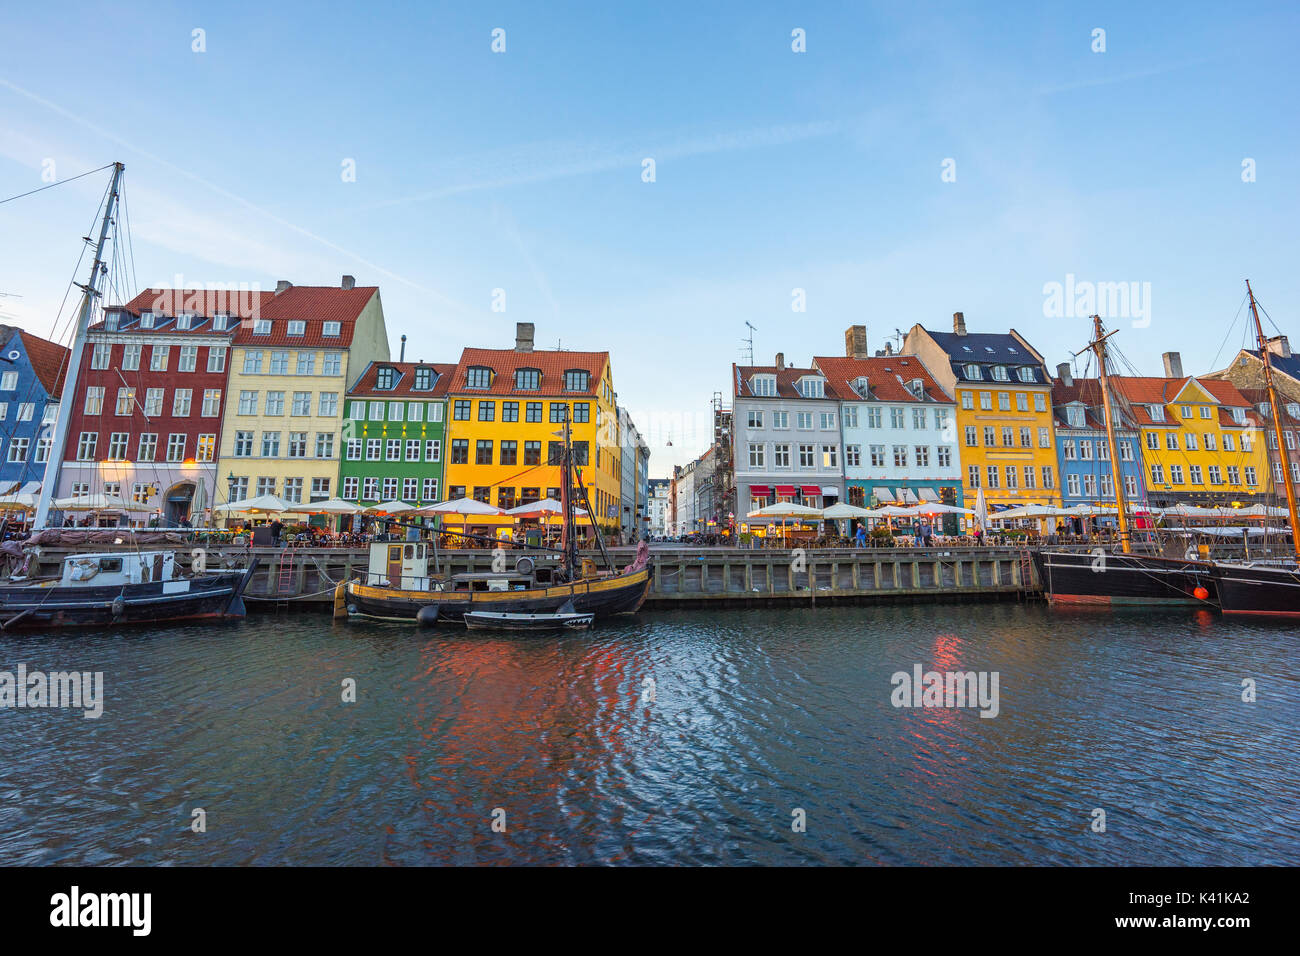 La antigua casa de Nyhavn en Copenhague, Dinamarca. Foto de stock